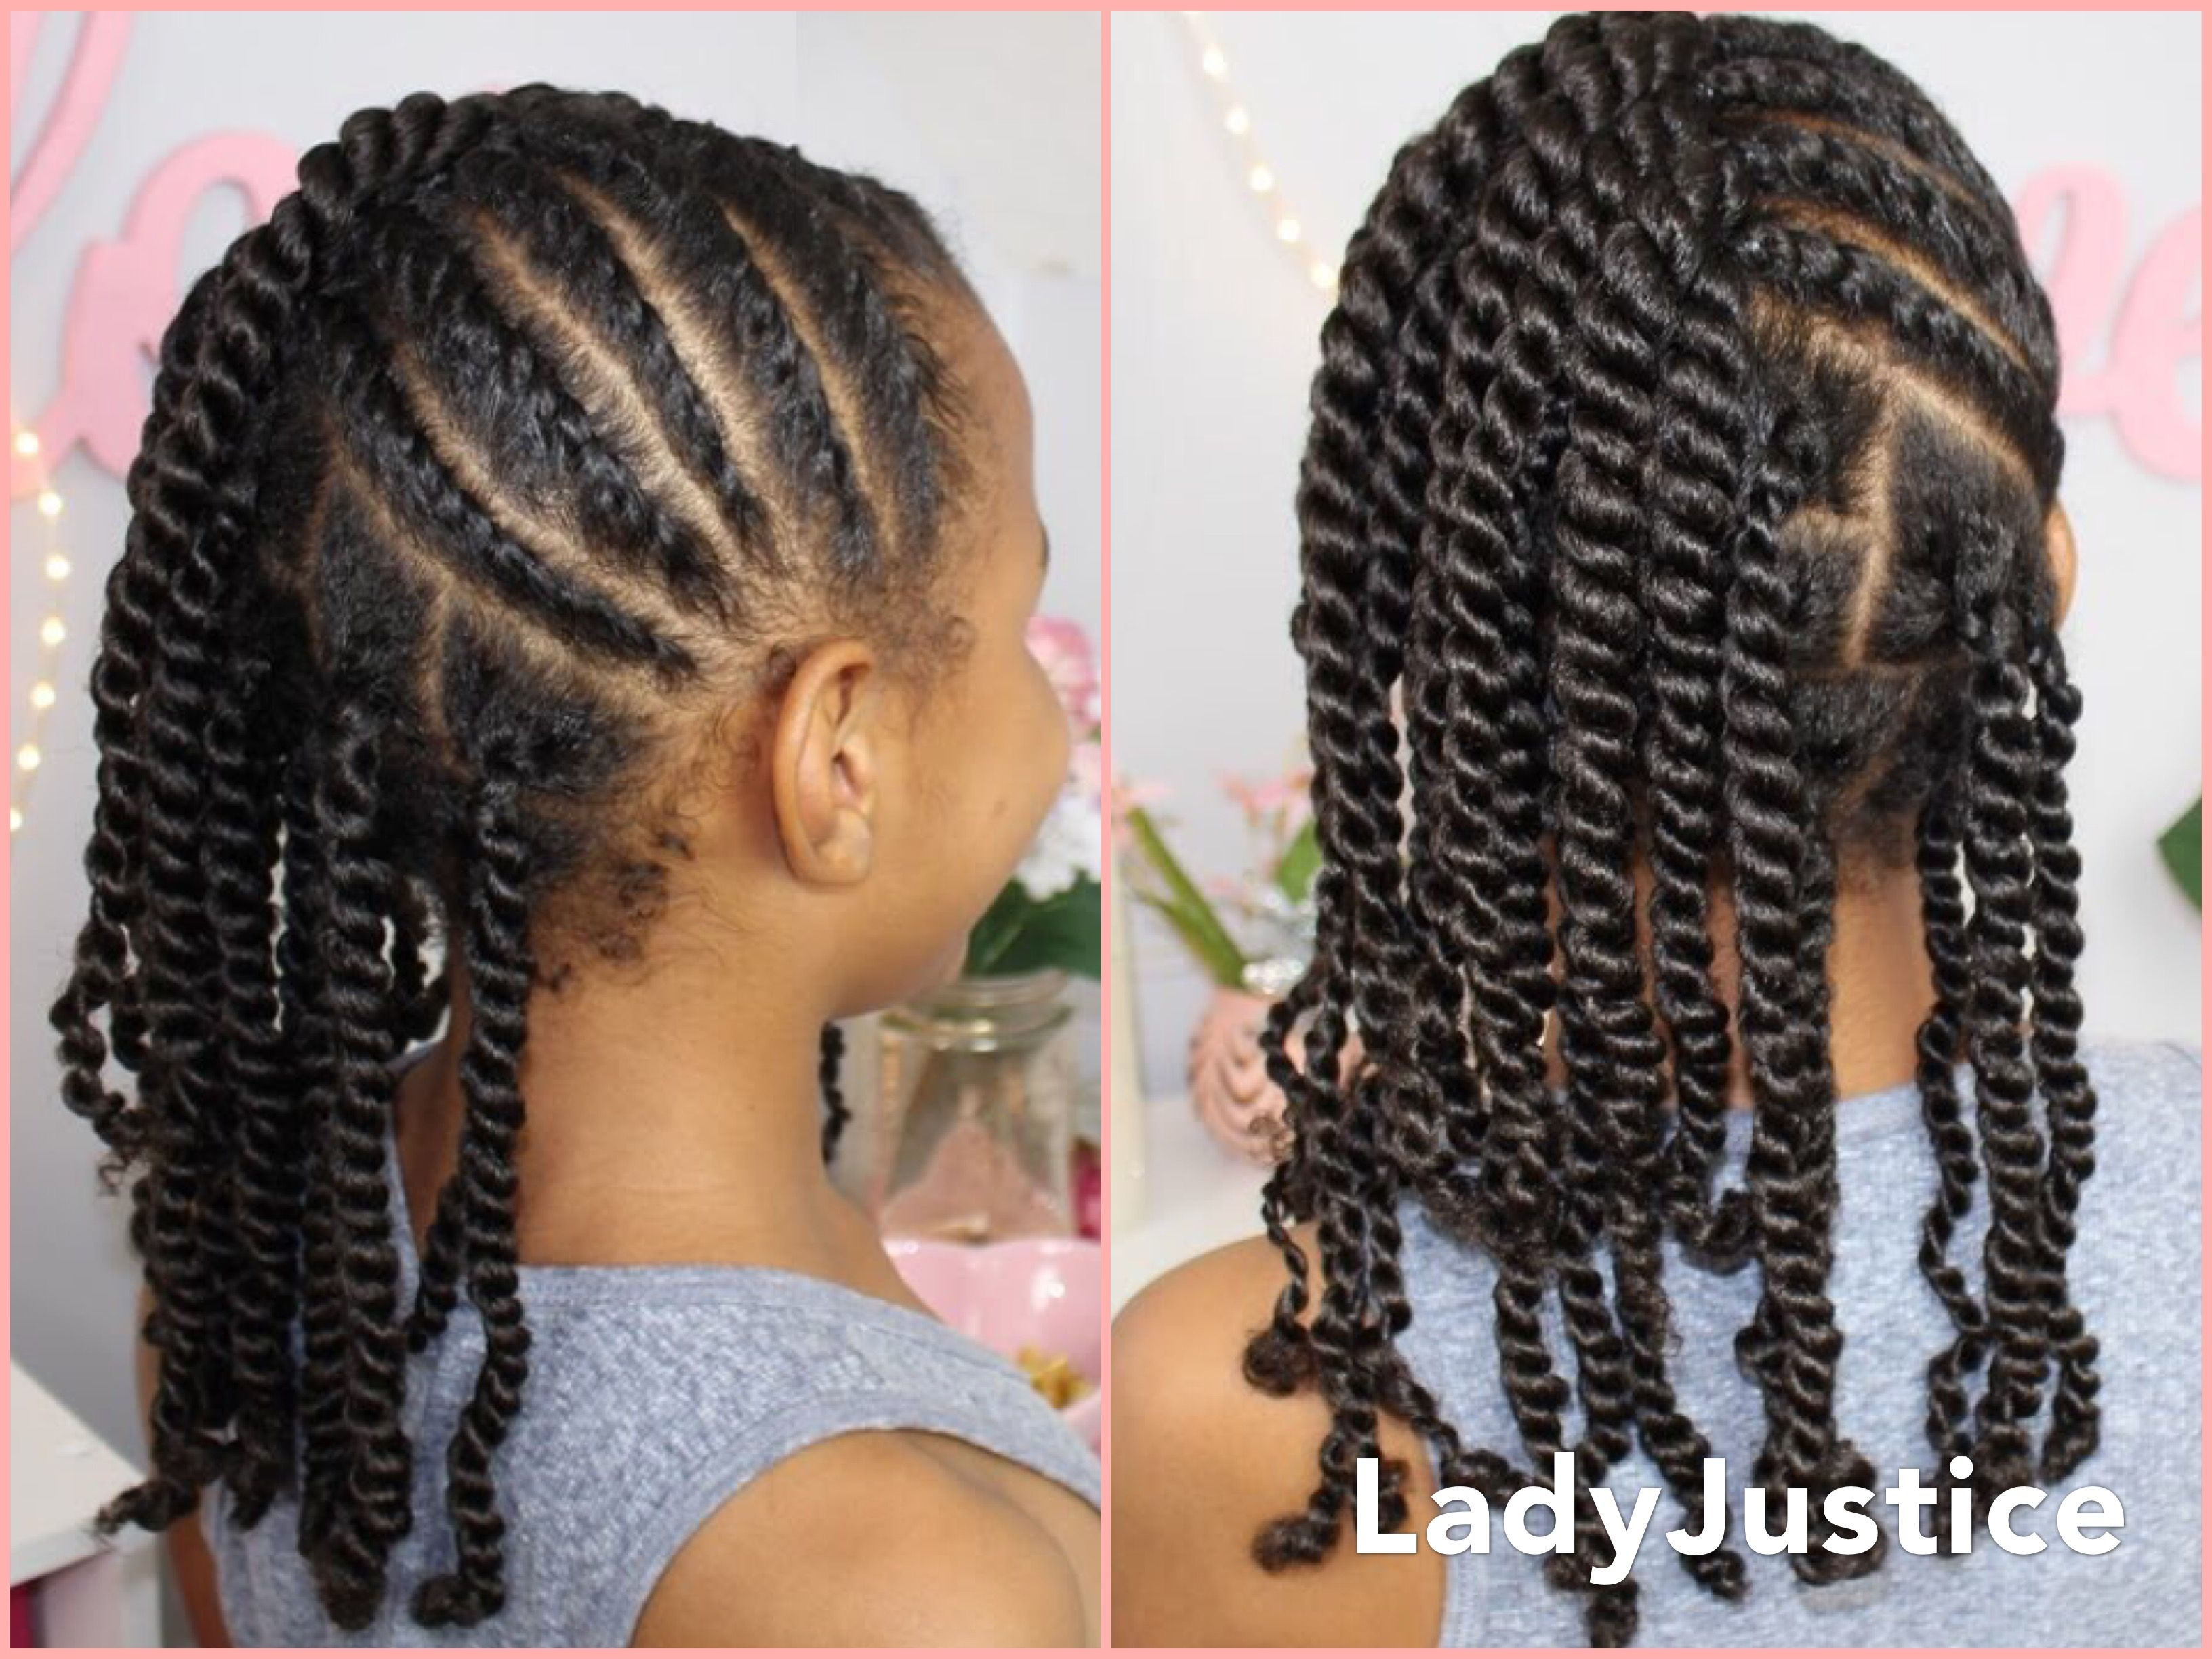 These 3 Cute Flat Twist Hairstyles Take Winning Prize